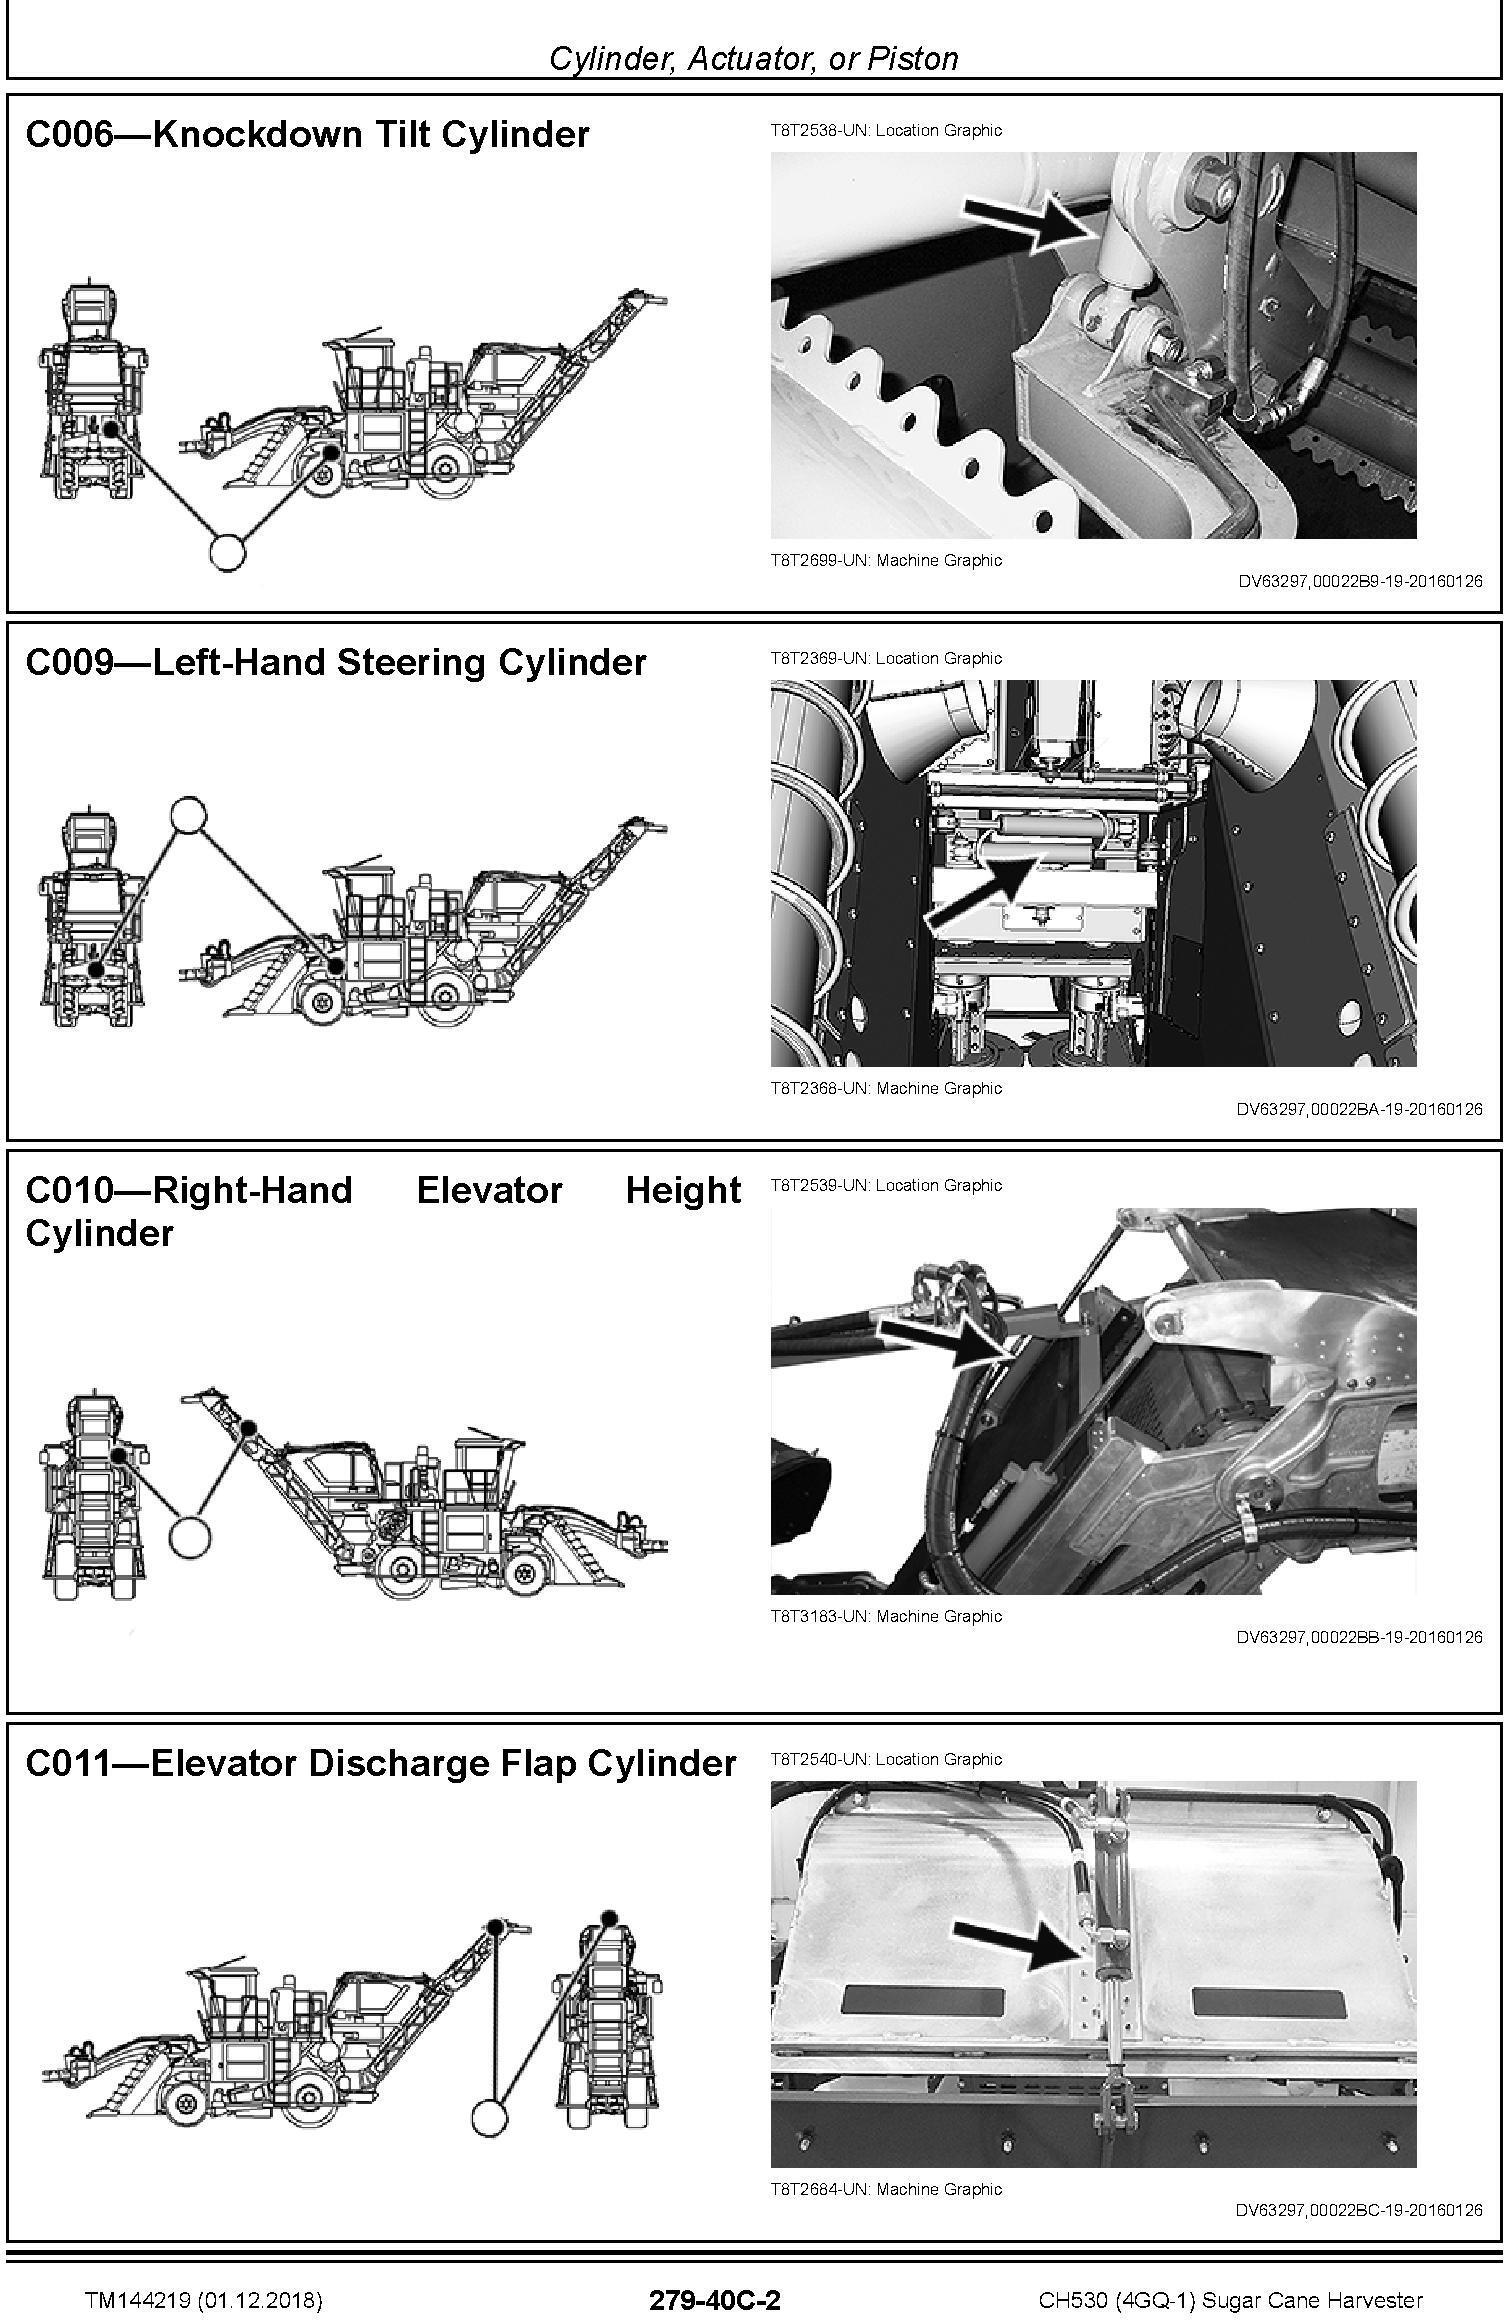 JD John Deere CH530 (4GQ-1) Sugar Cane Harvester Diagnostic Technical Service Manual (TM144219) - 3